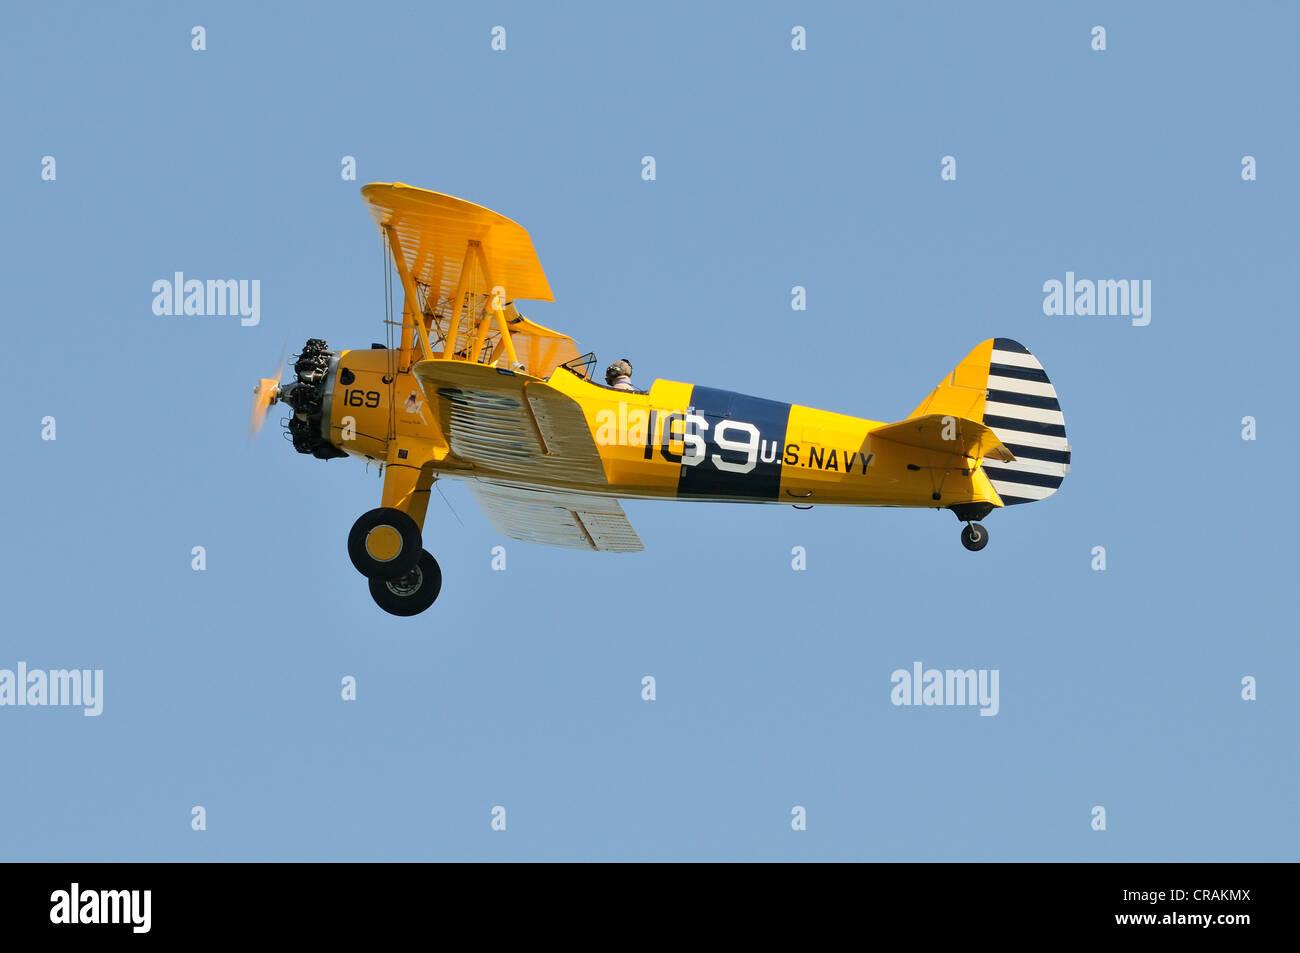 American Boeing PT17 Stearman biplane, Europe's largest meeting of vintage aircraft in Hahnweide, Kirchheim - Stock Image